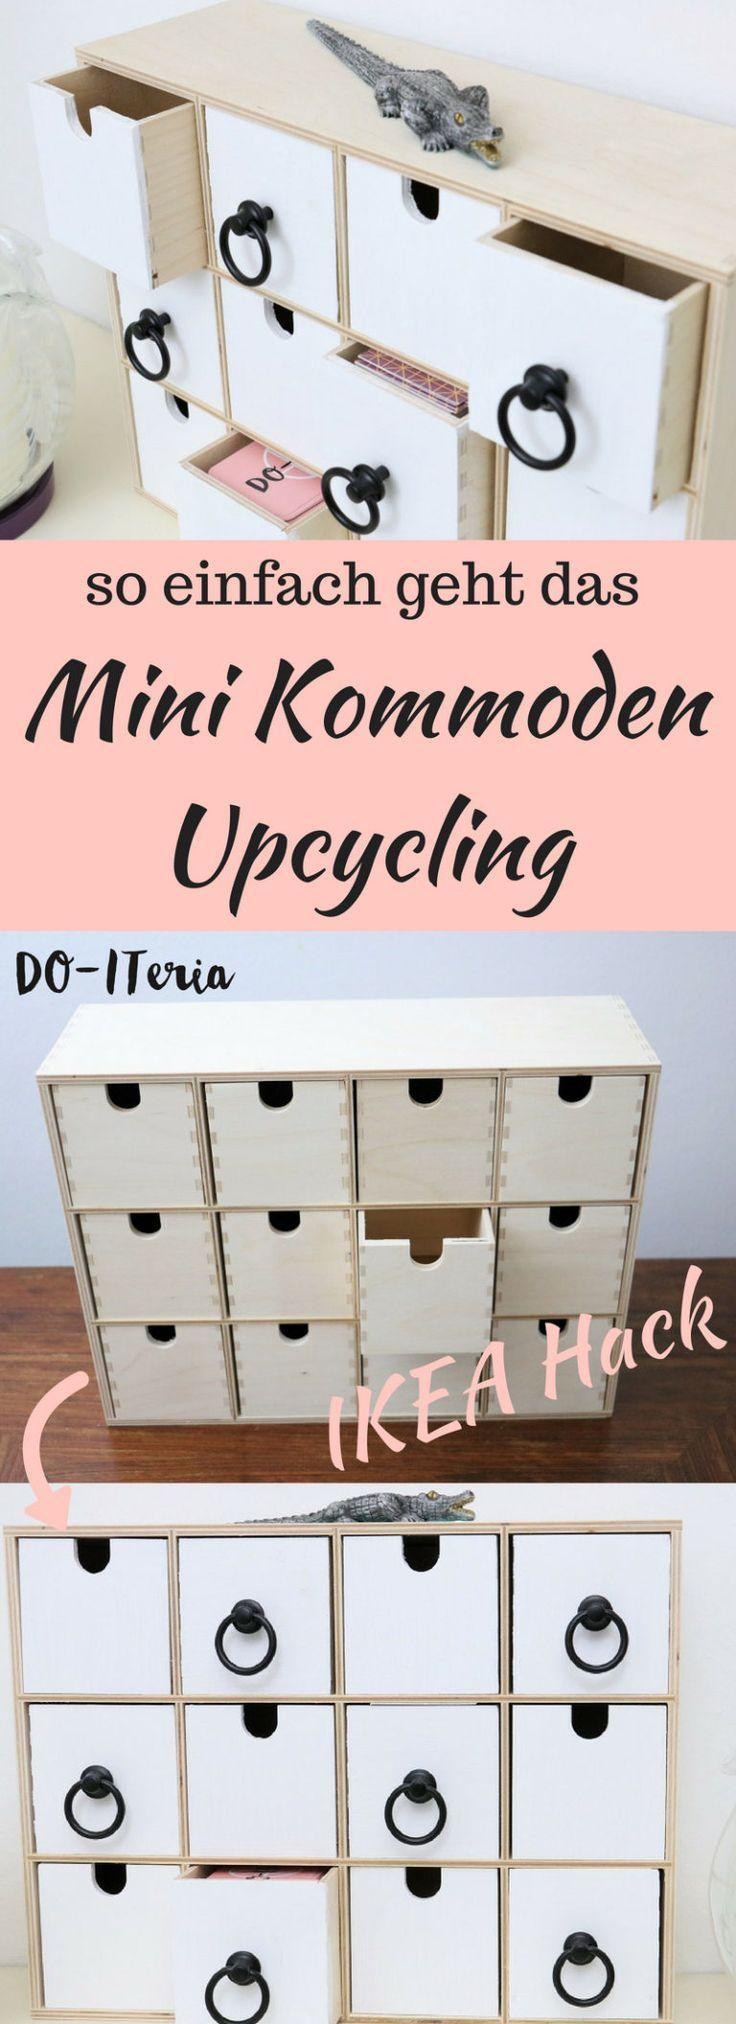 ikea hack schickes upcycling einer mini kommode ideas. Black Bedroom Furniture Sets. Home Design Ideas